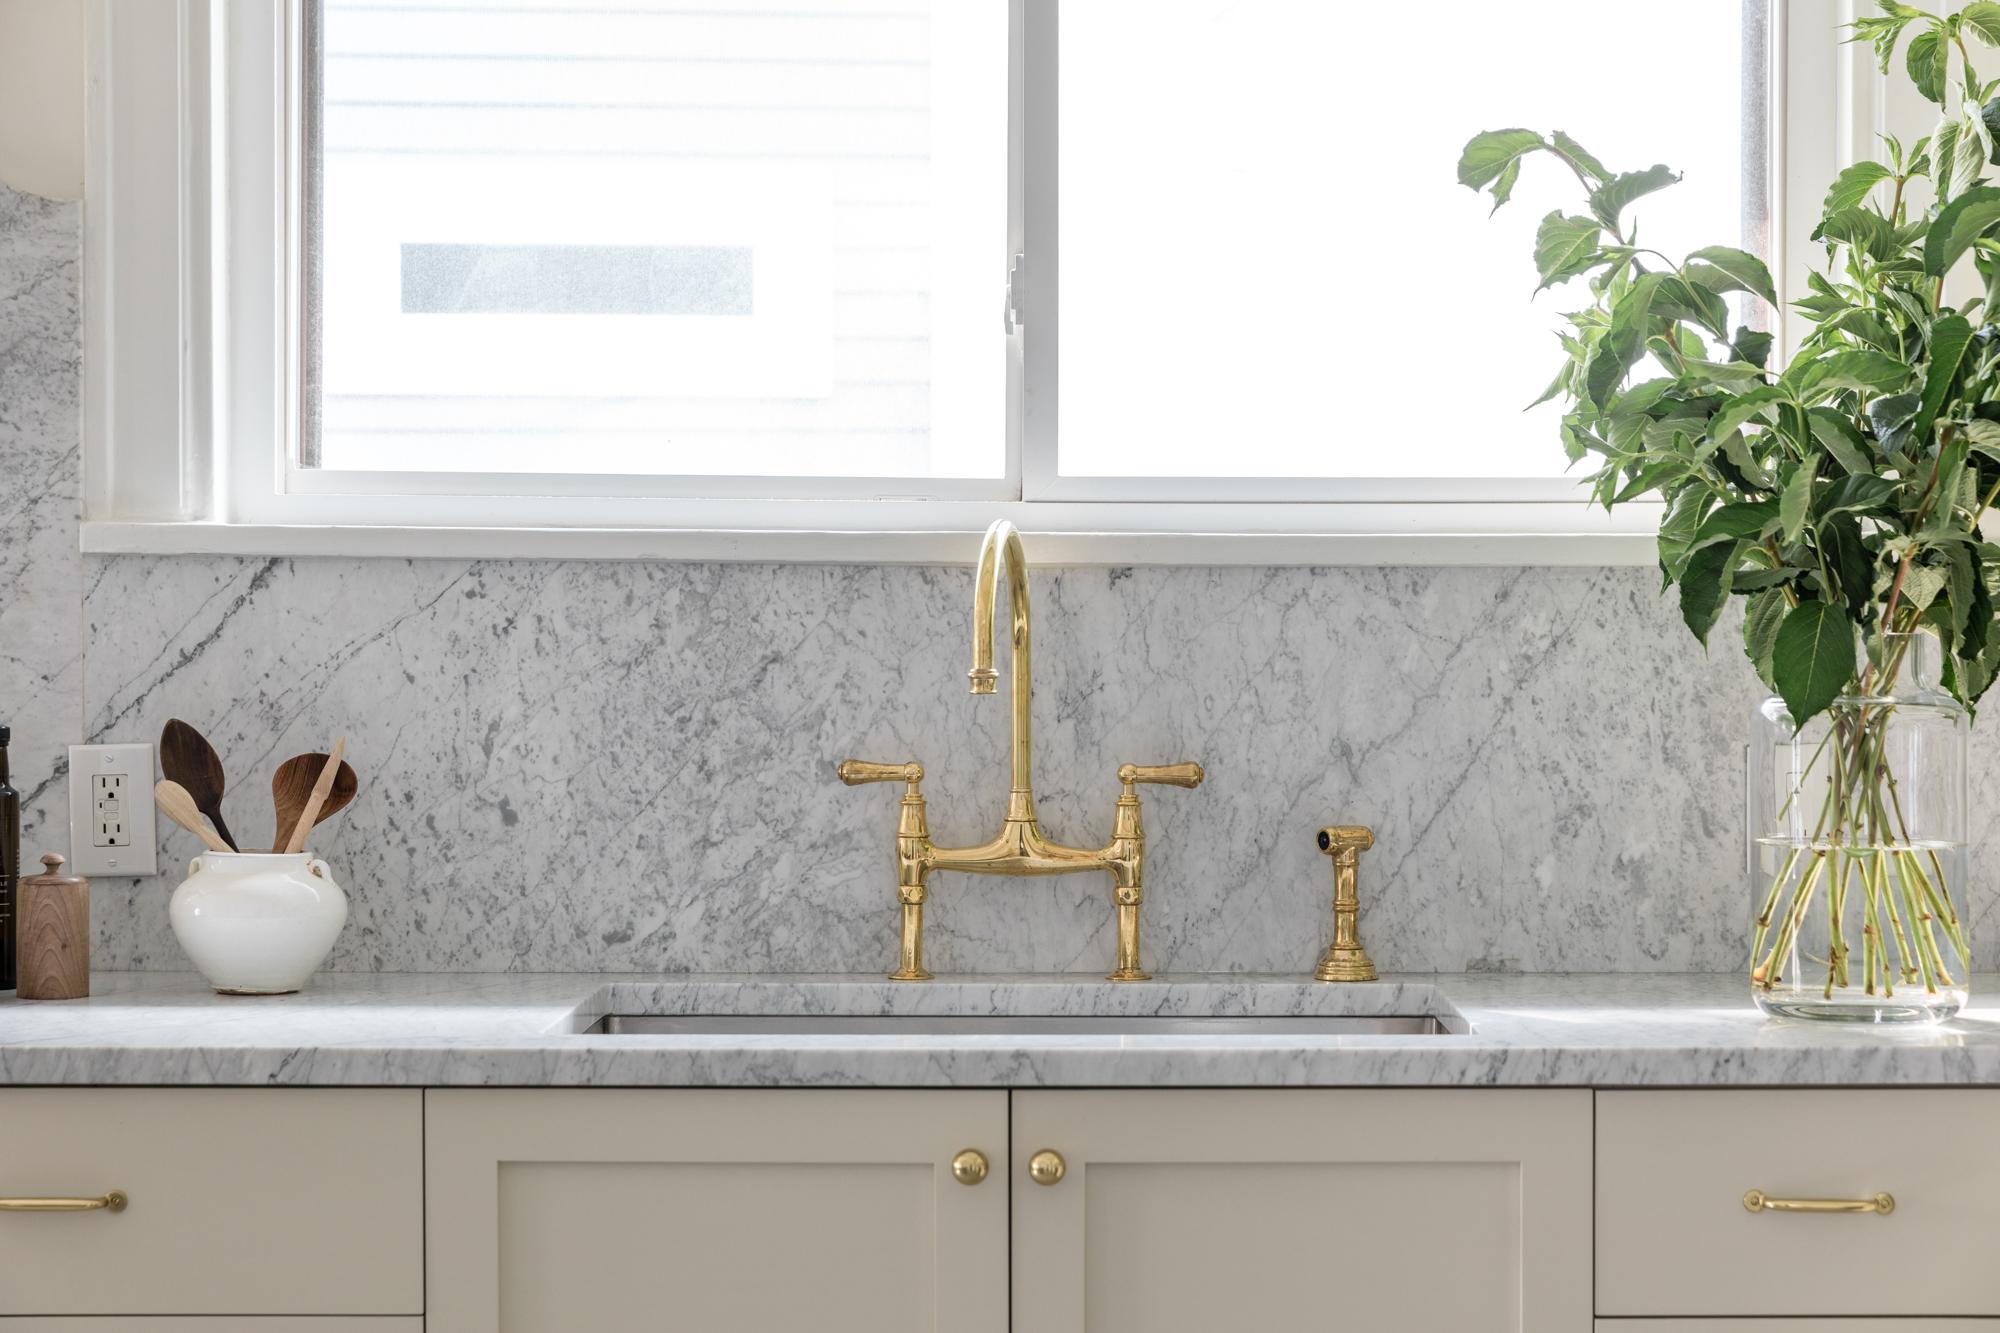 JGMB Lauren Bradshaw Design East Hill Kitchen Renovation Rohl Faucet.jpg